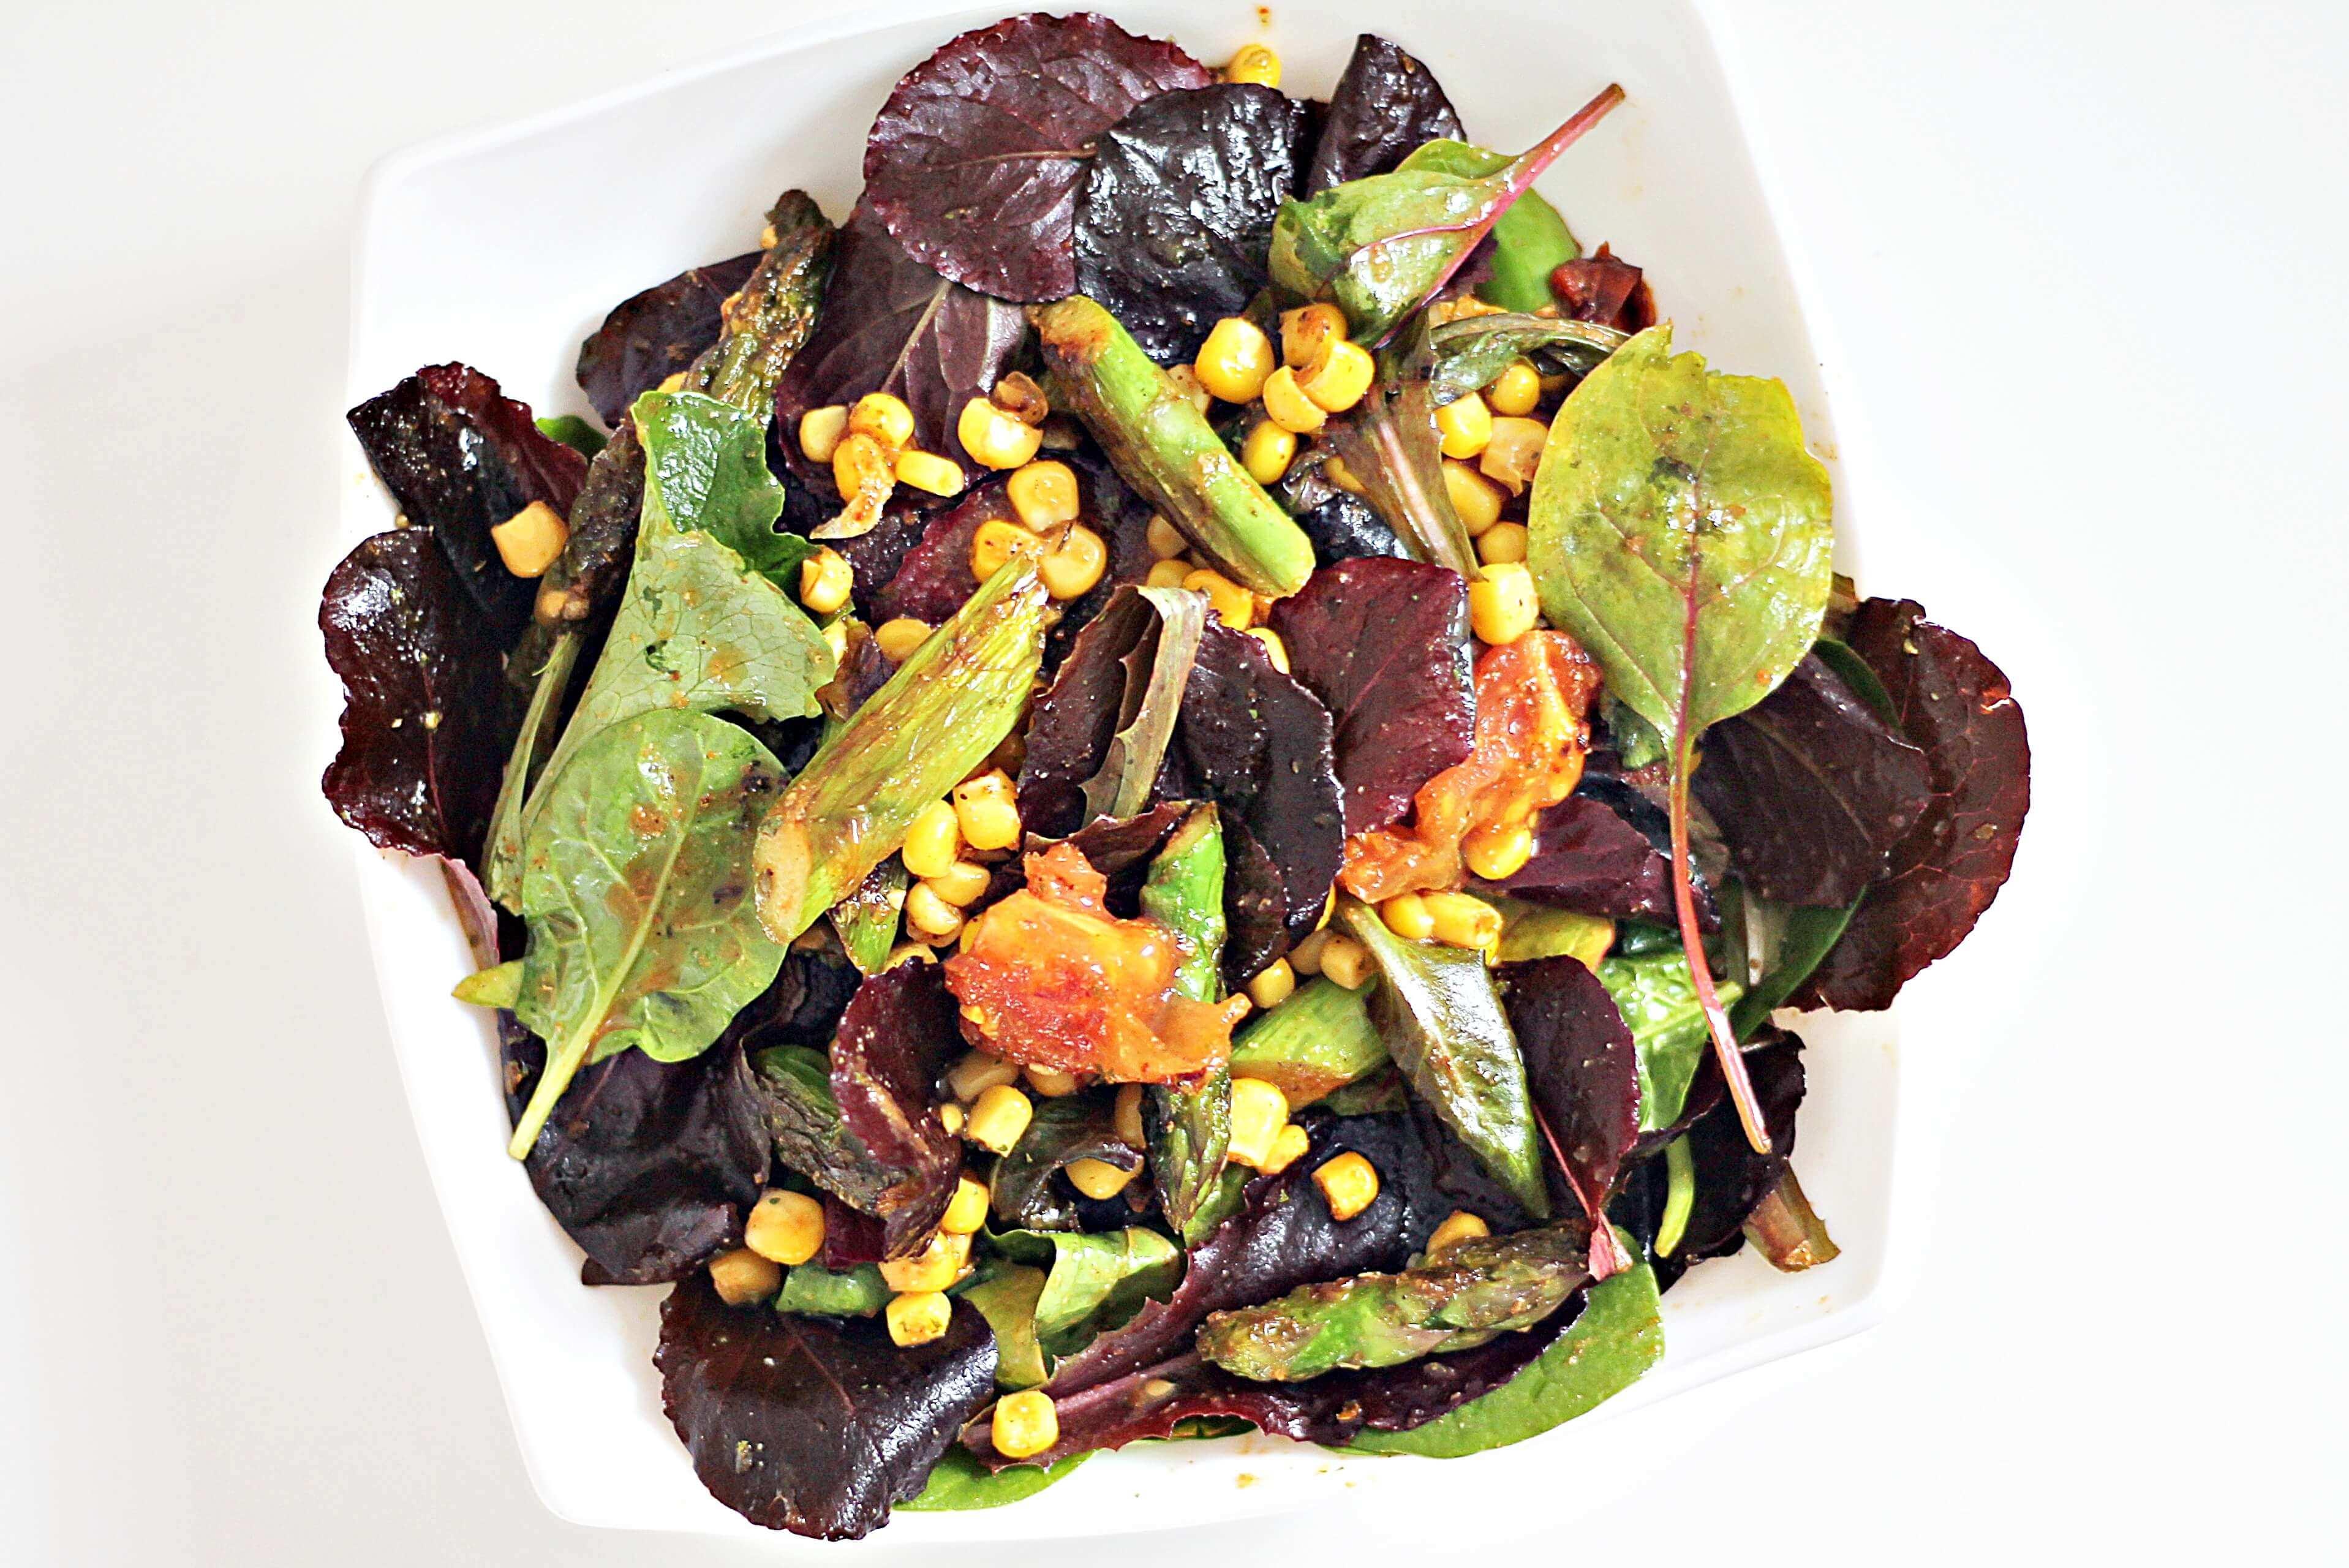 5 schnelle Salat-Ideen